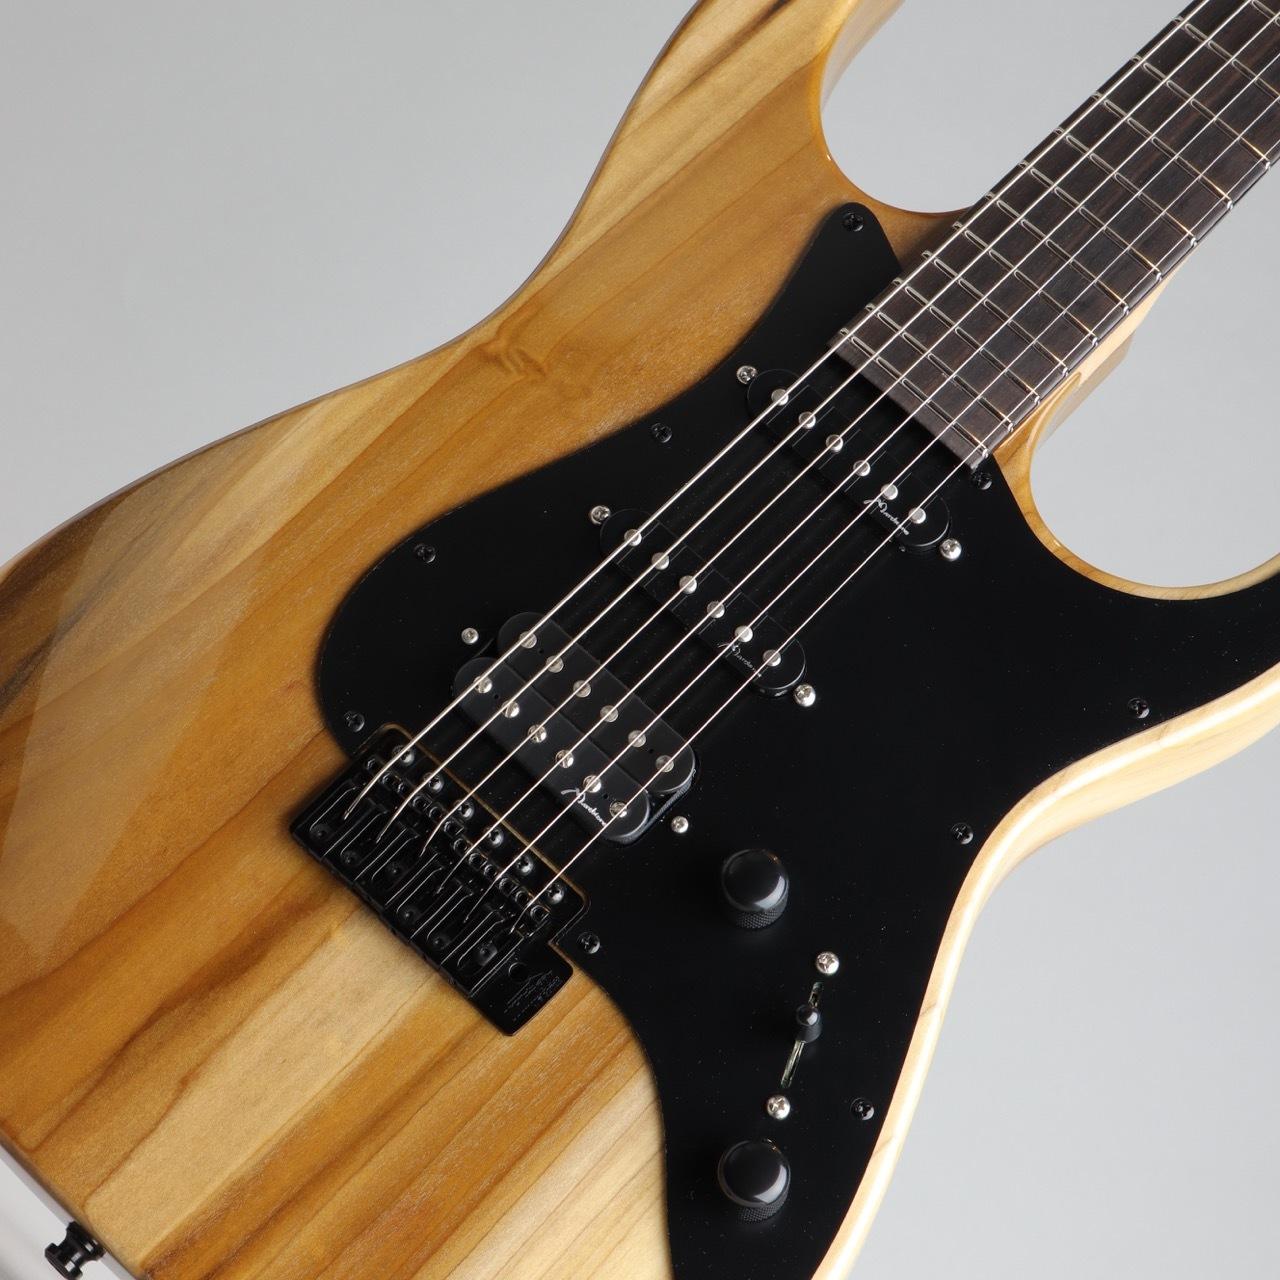 Marchione Guitars Vintage Tremolo Poplar SSH: Shopping for